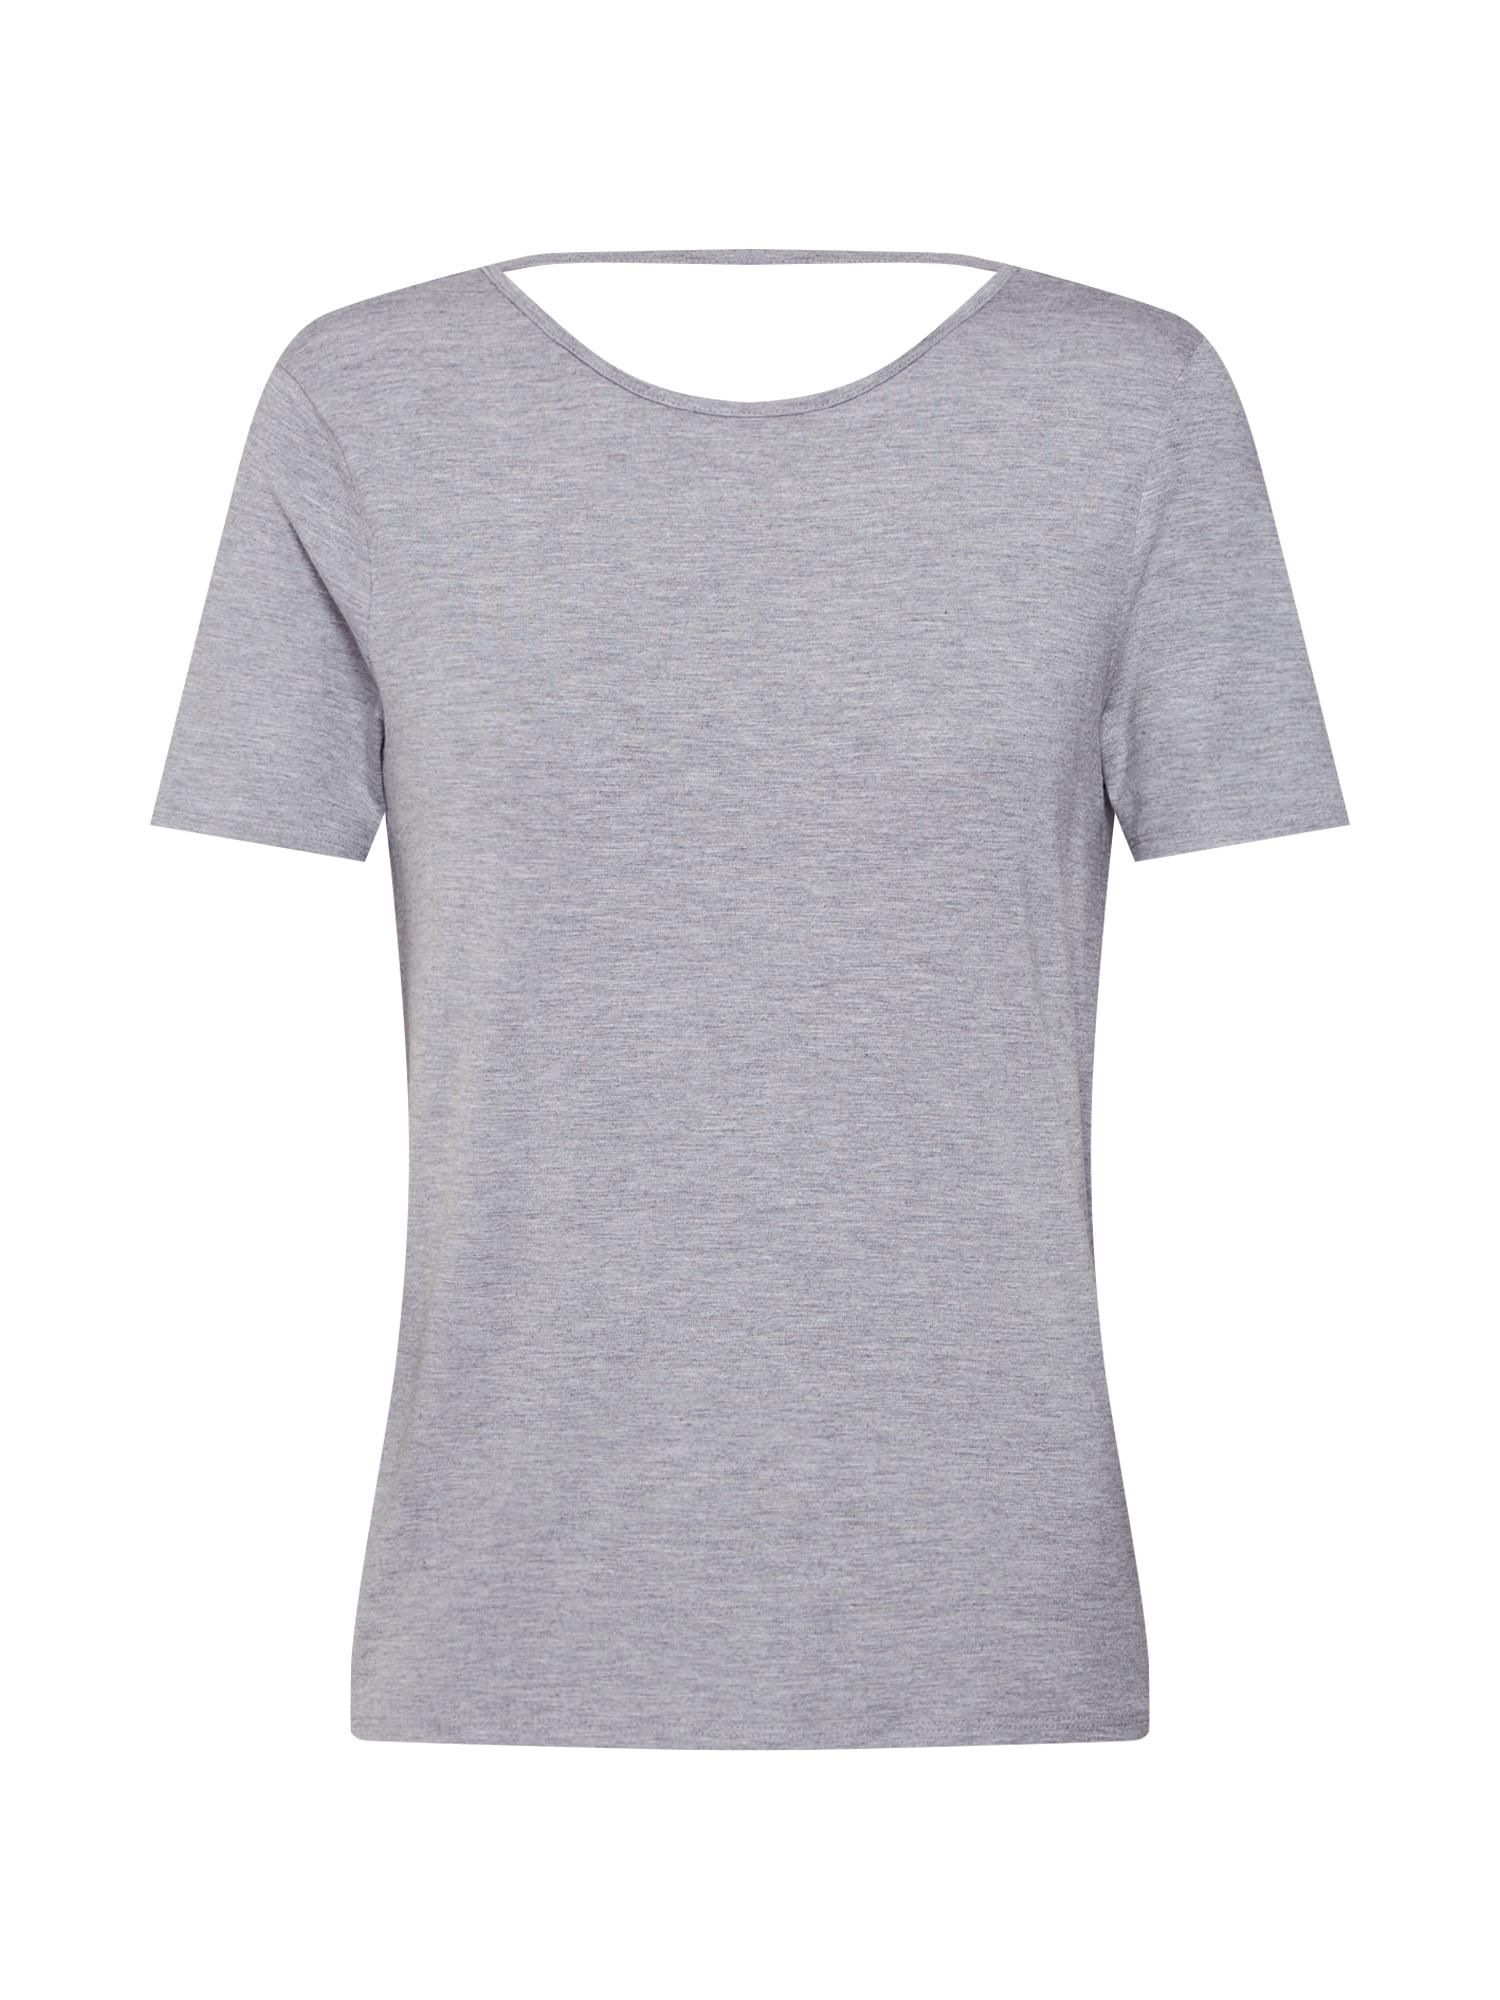 Tričko BEHANNA šedý melír Noisy May